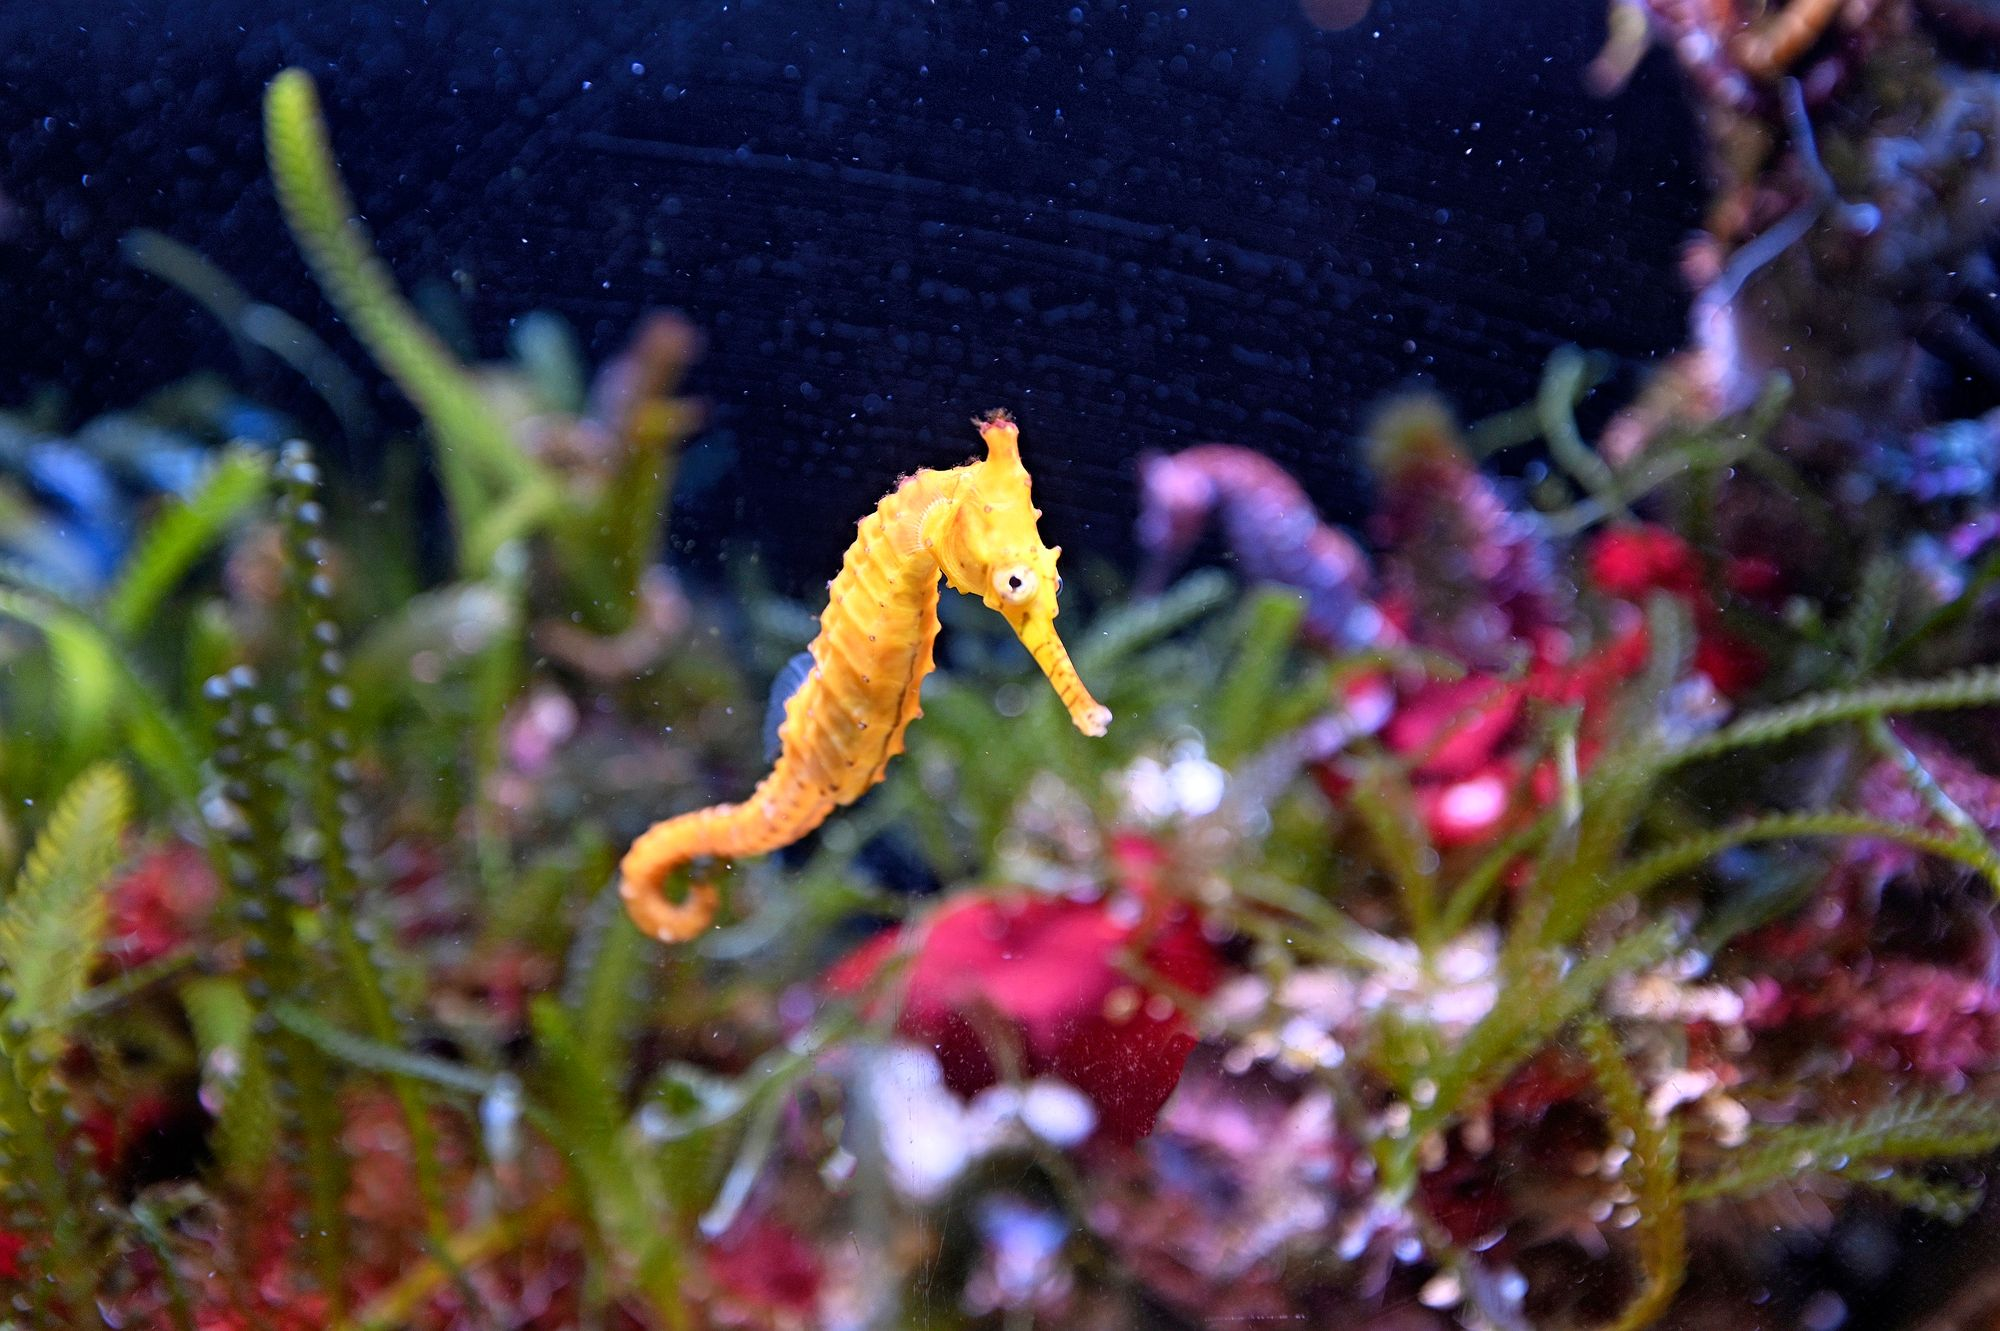 Tiger snout seahorse - West Australian seahorse (Hippocampus subelongatus) swim underwater in Ningaloo reef in Western Australia. © iStock